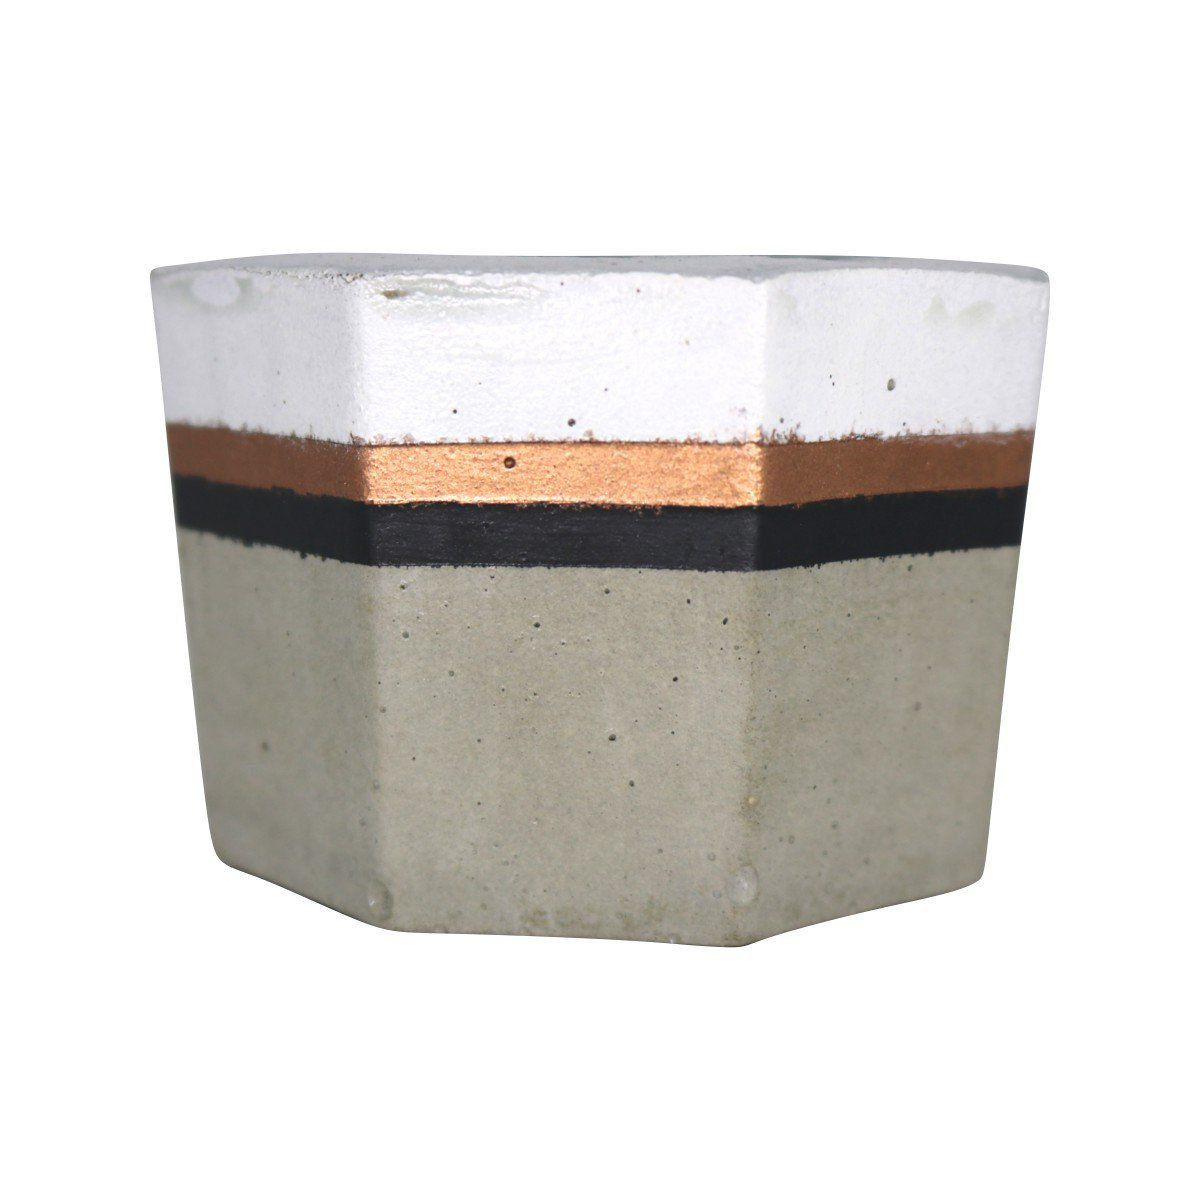 Vaso de cimento 5cm x 8cm MD13PCB